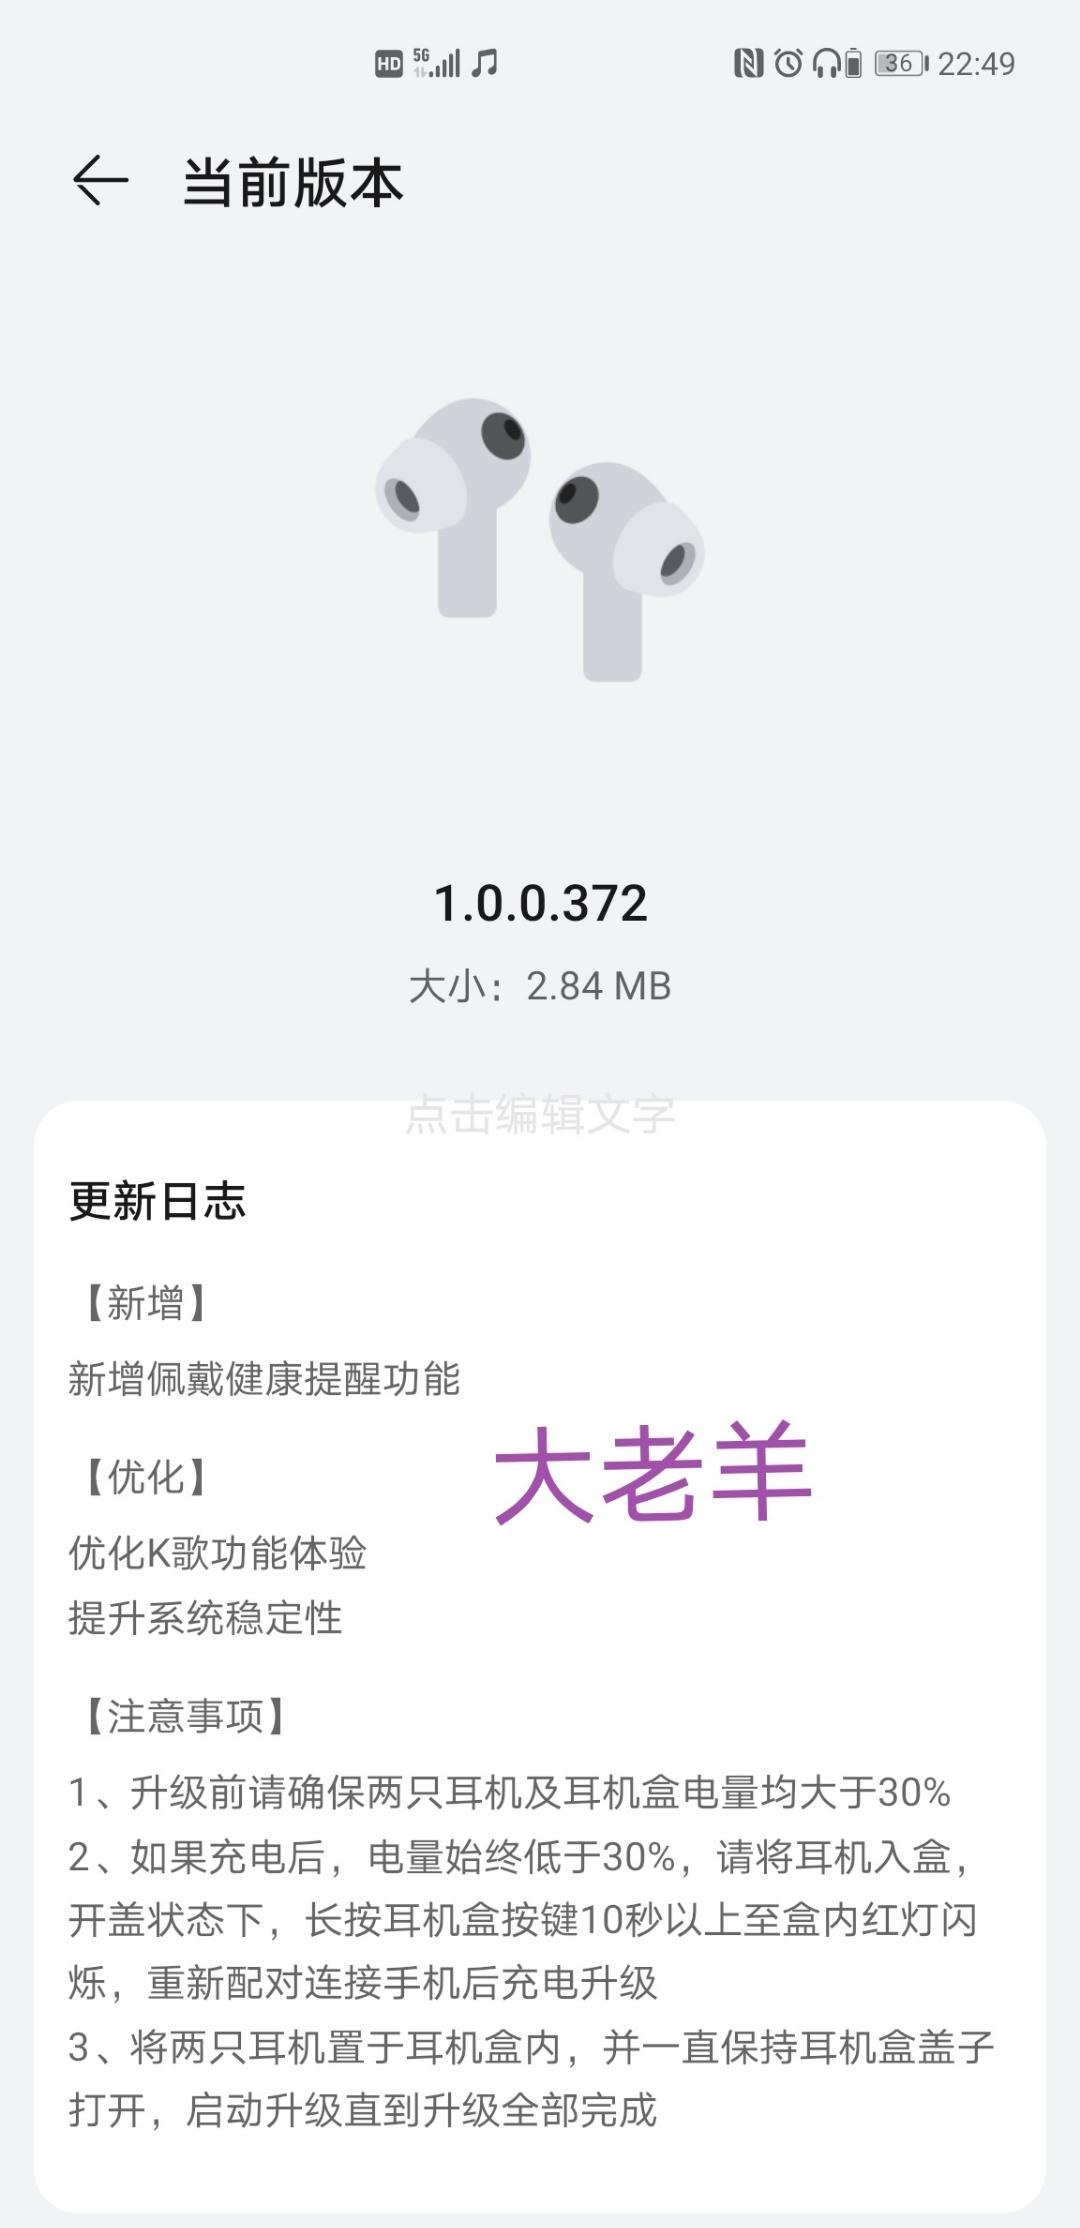 Screenshot_20210520_224940_com.huawei.smarthome_edit_653798699739820.jpg